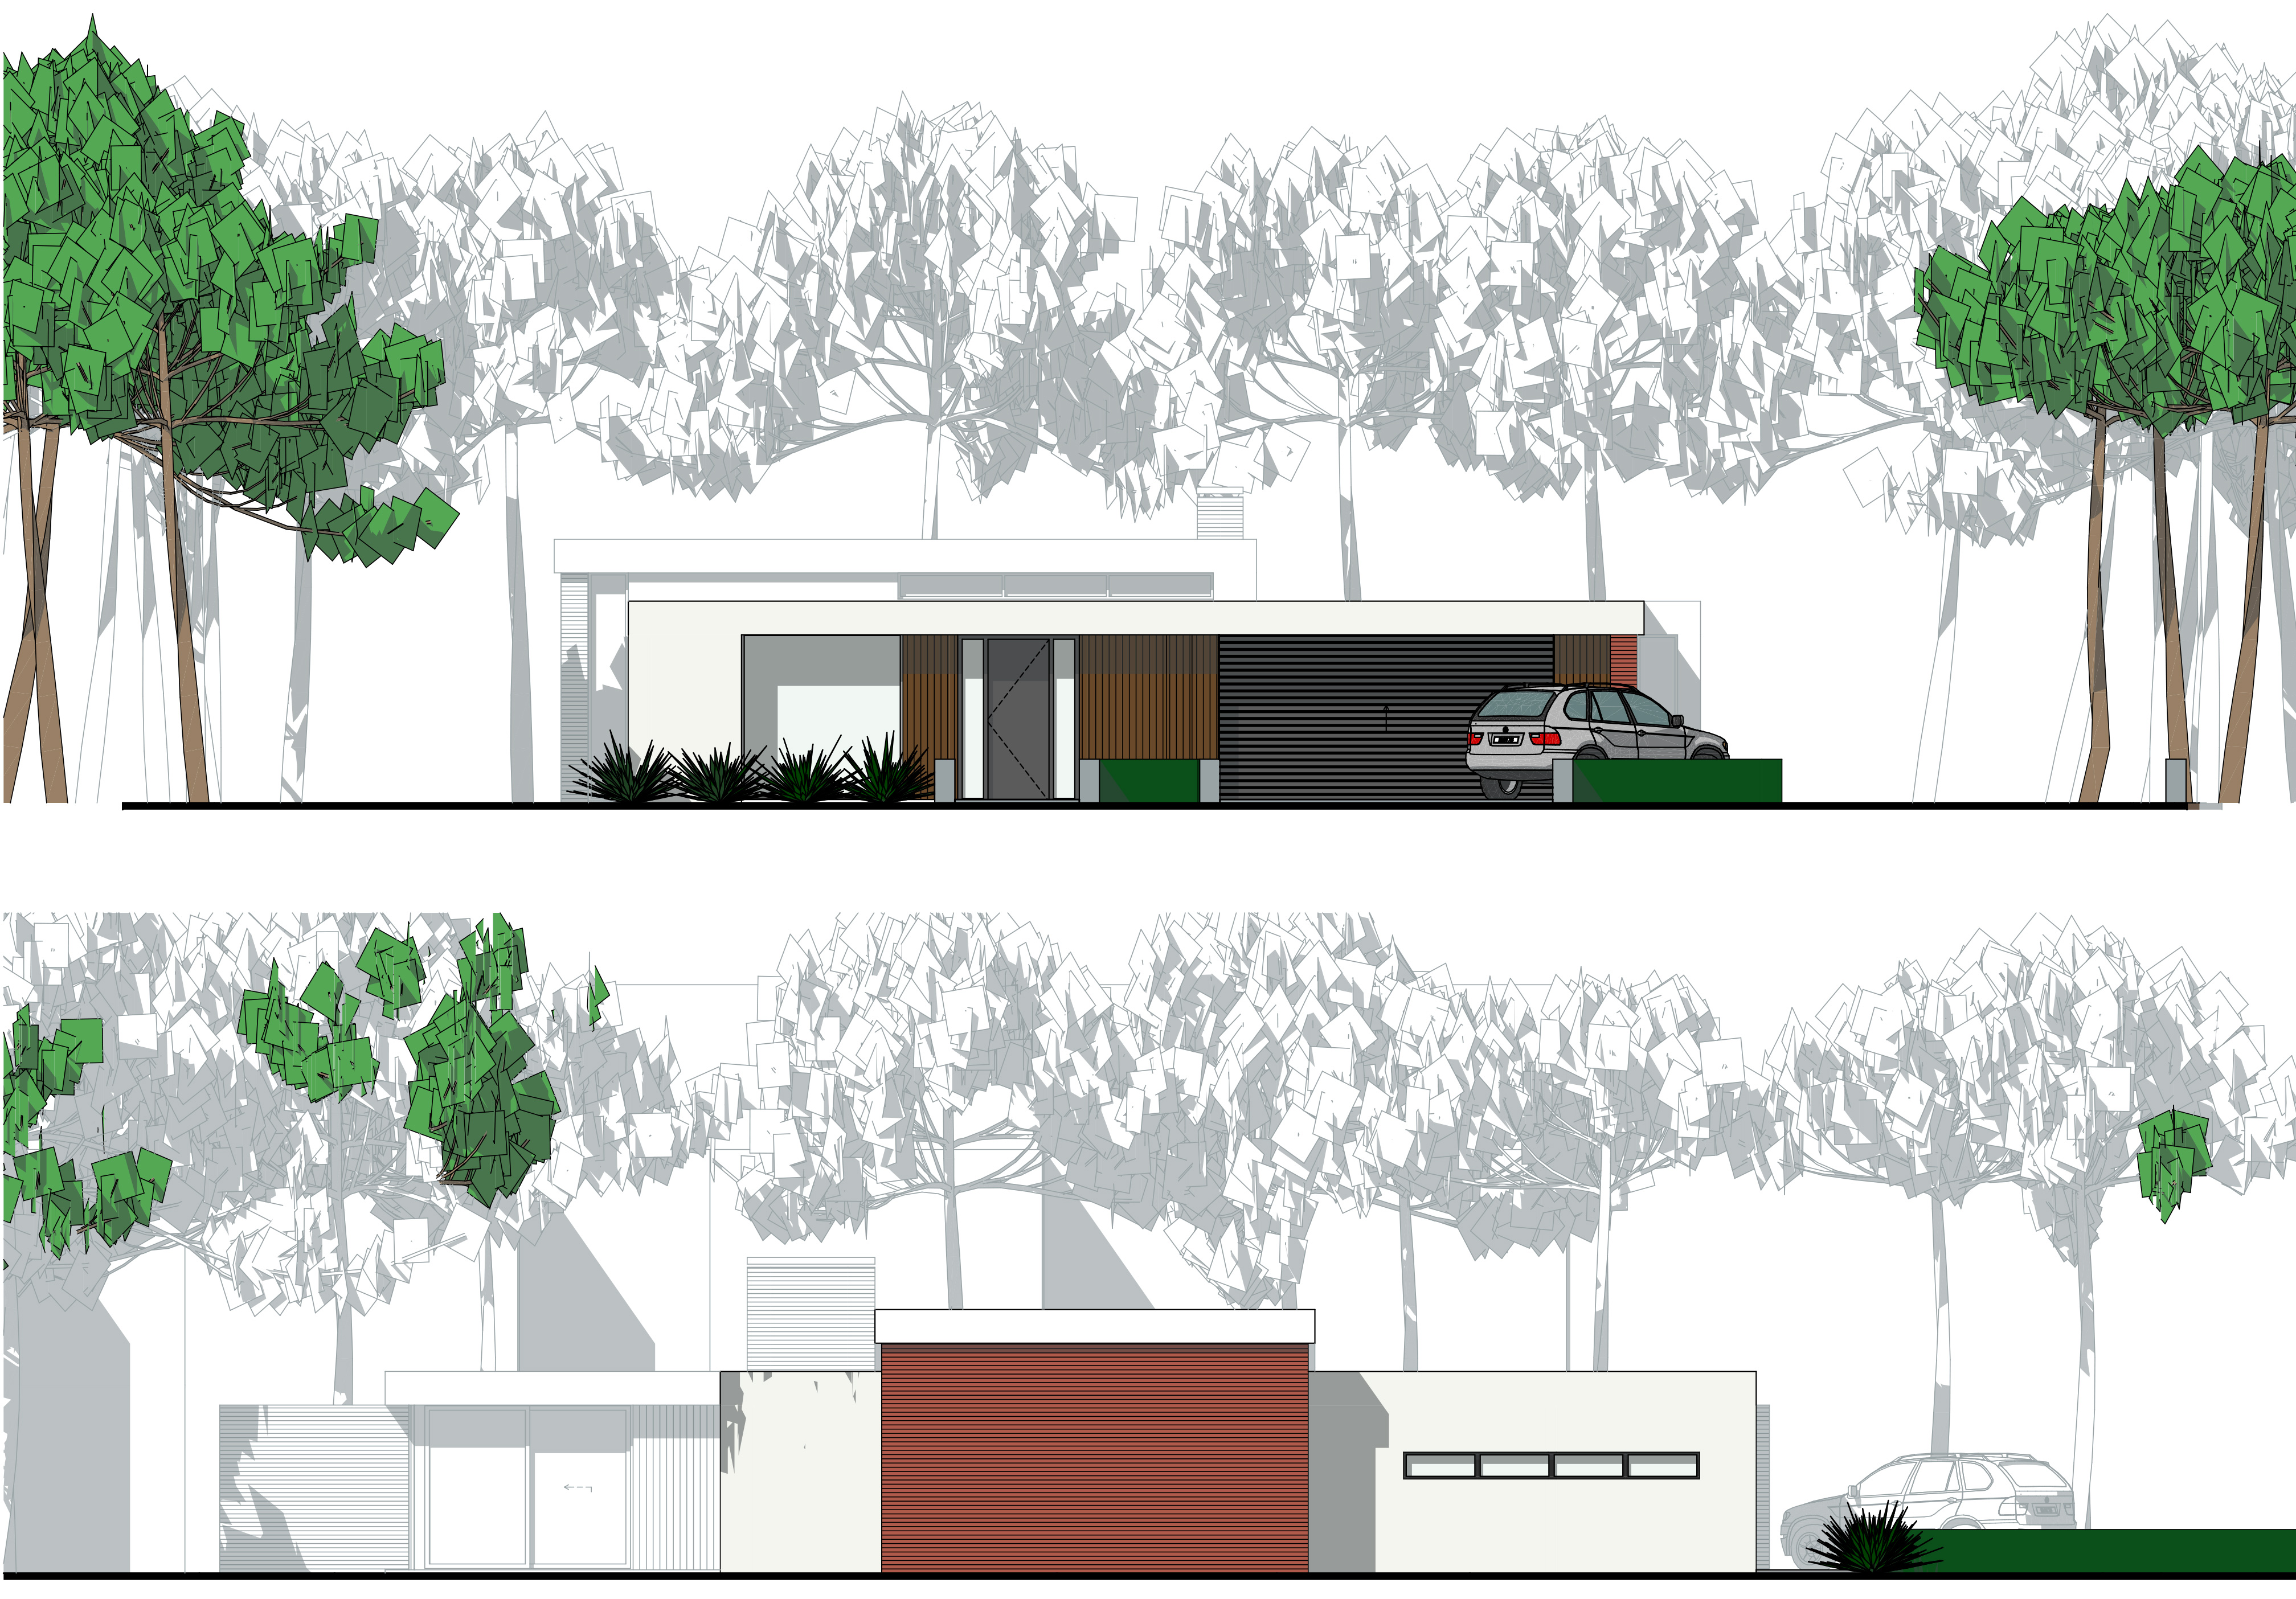 Nieuwbouw villa onder architectuur: gevelaanzichten